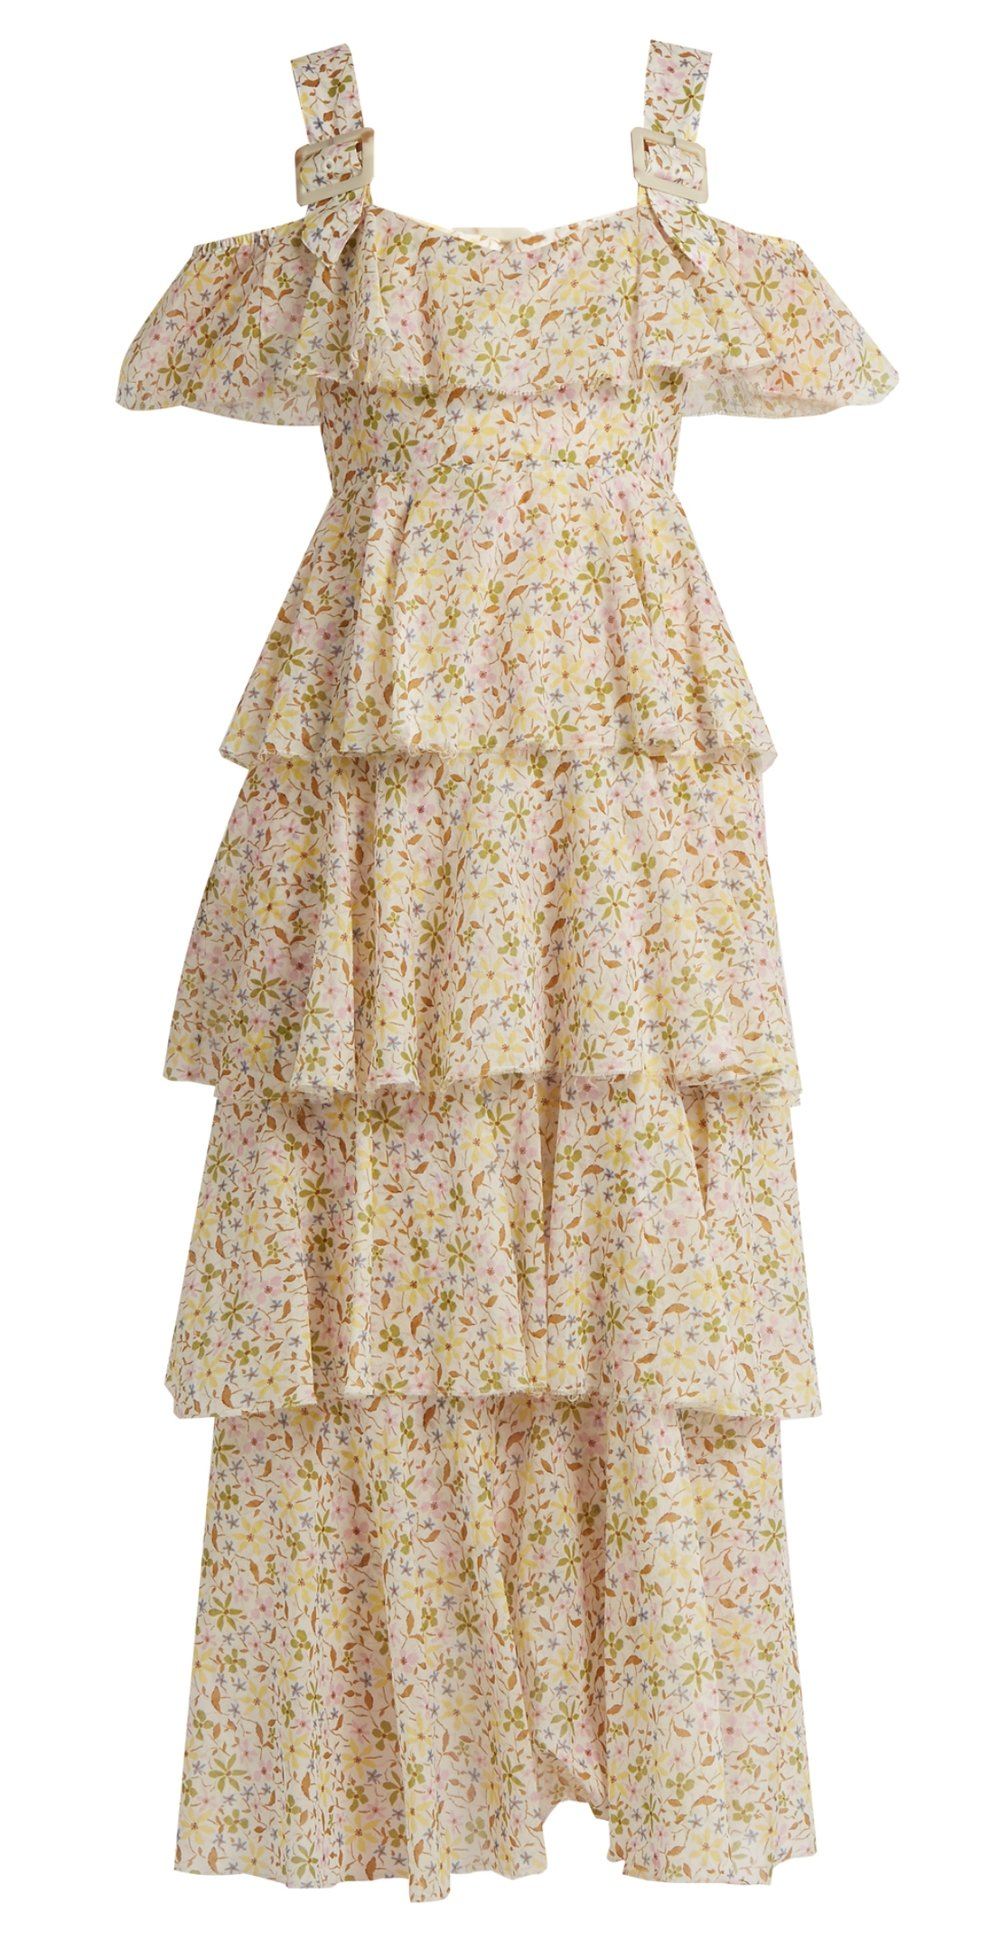 ALEXACHUNG cotton ditsy floral tiered dress, Moda Operandi $785